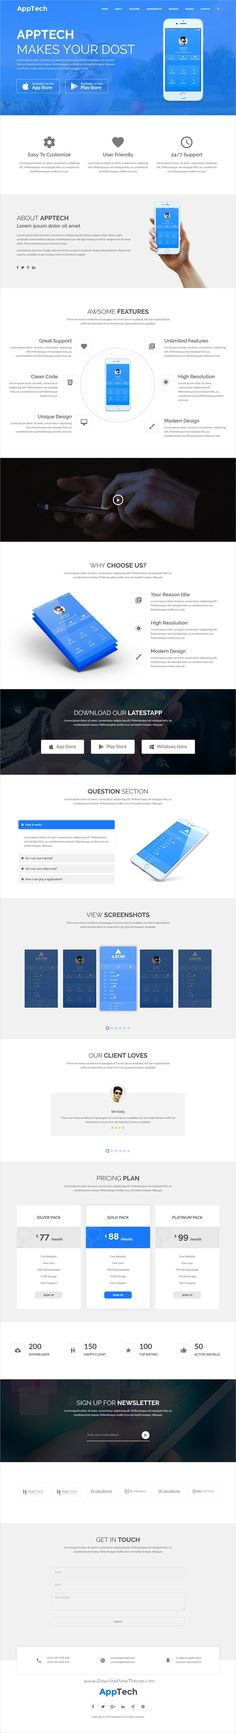 Wordpress starter theme | Web Design | Pinterest | Starters ...